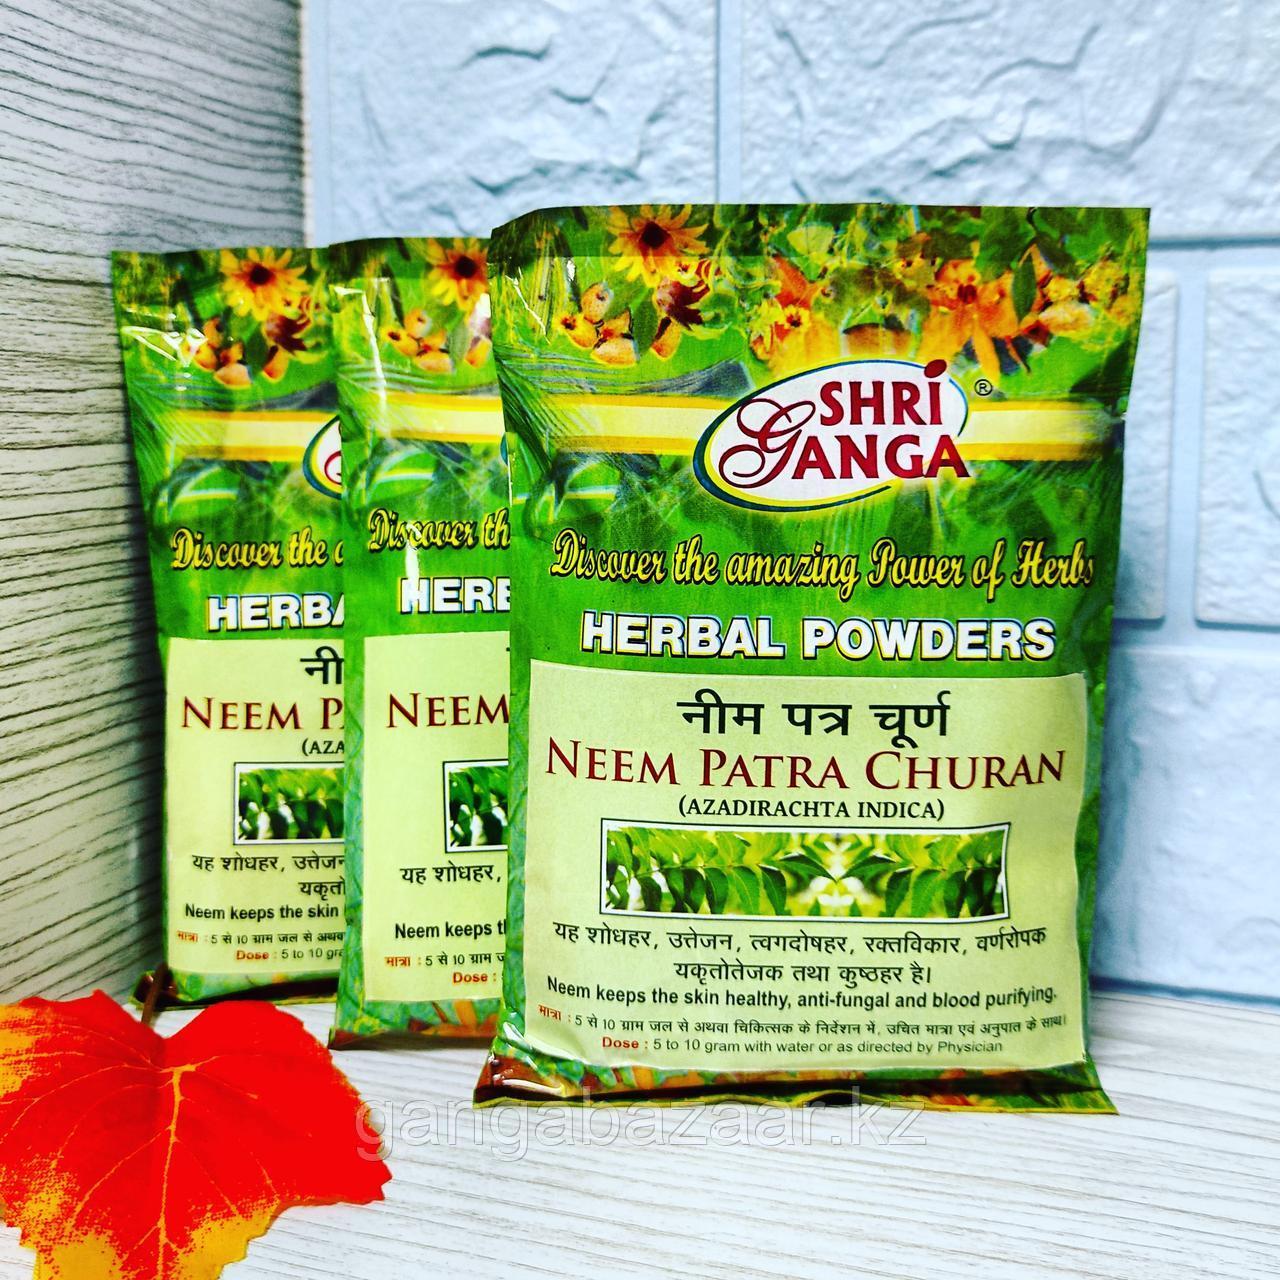 Ним чурна (Neem Patra Churna, Sri Ganga) - очищение лимфы, кожи, антисептик, укрепление иммунитета, 100 гр